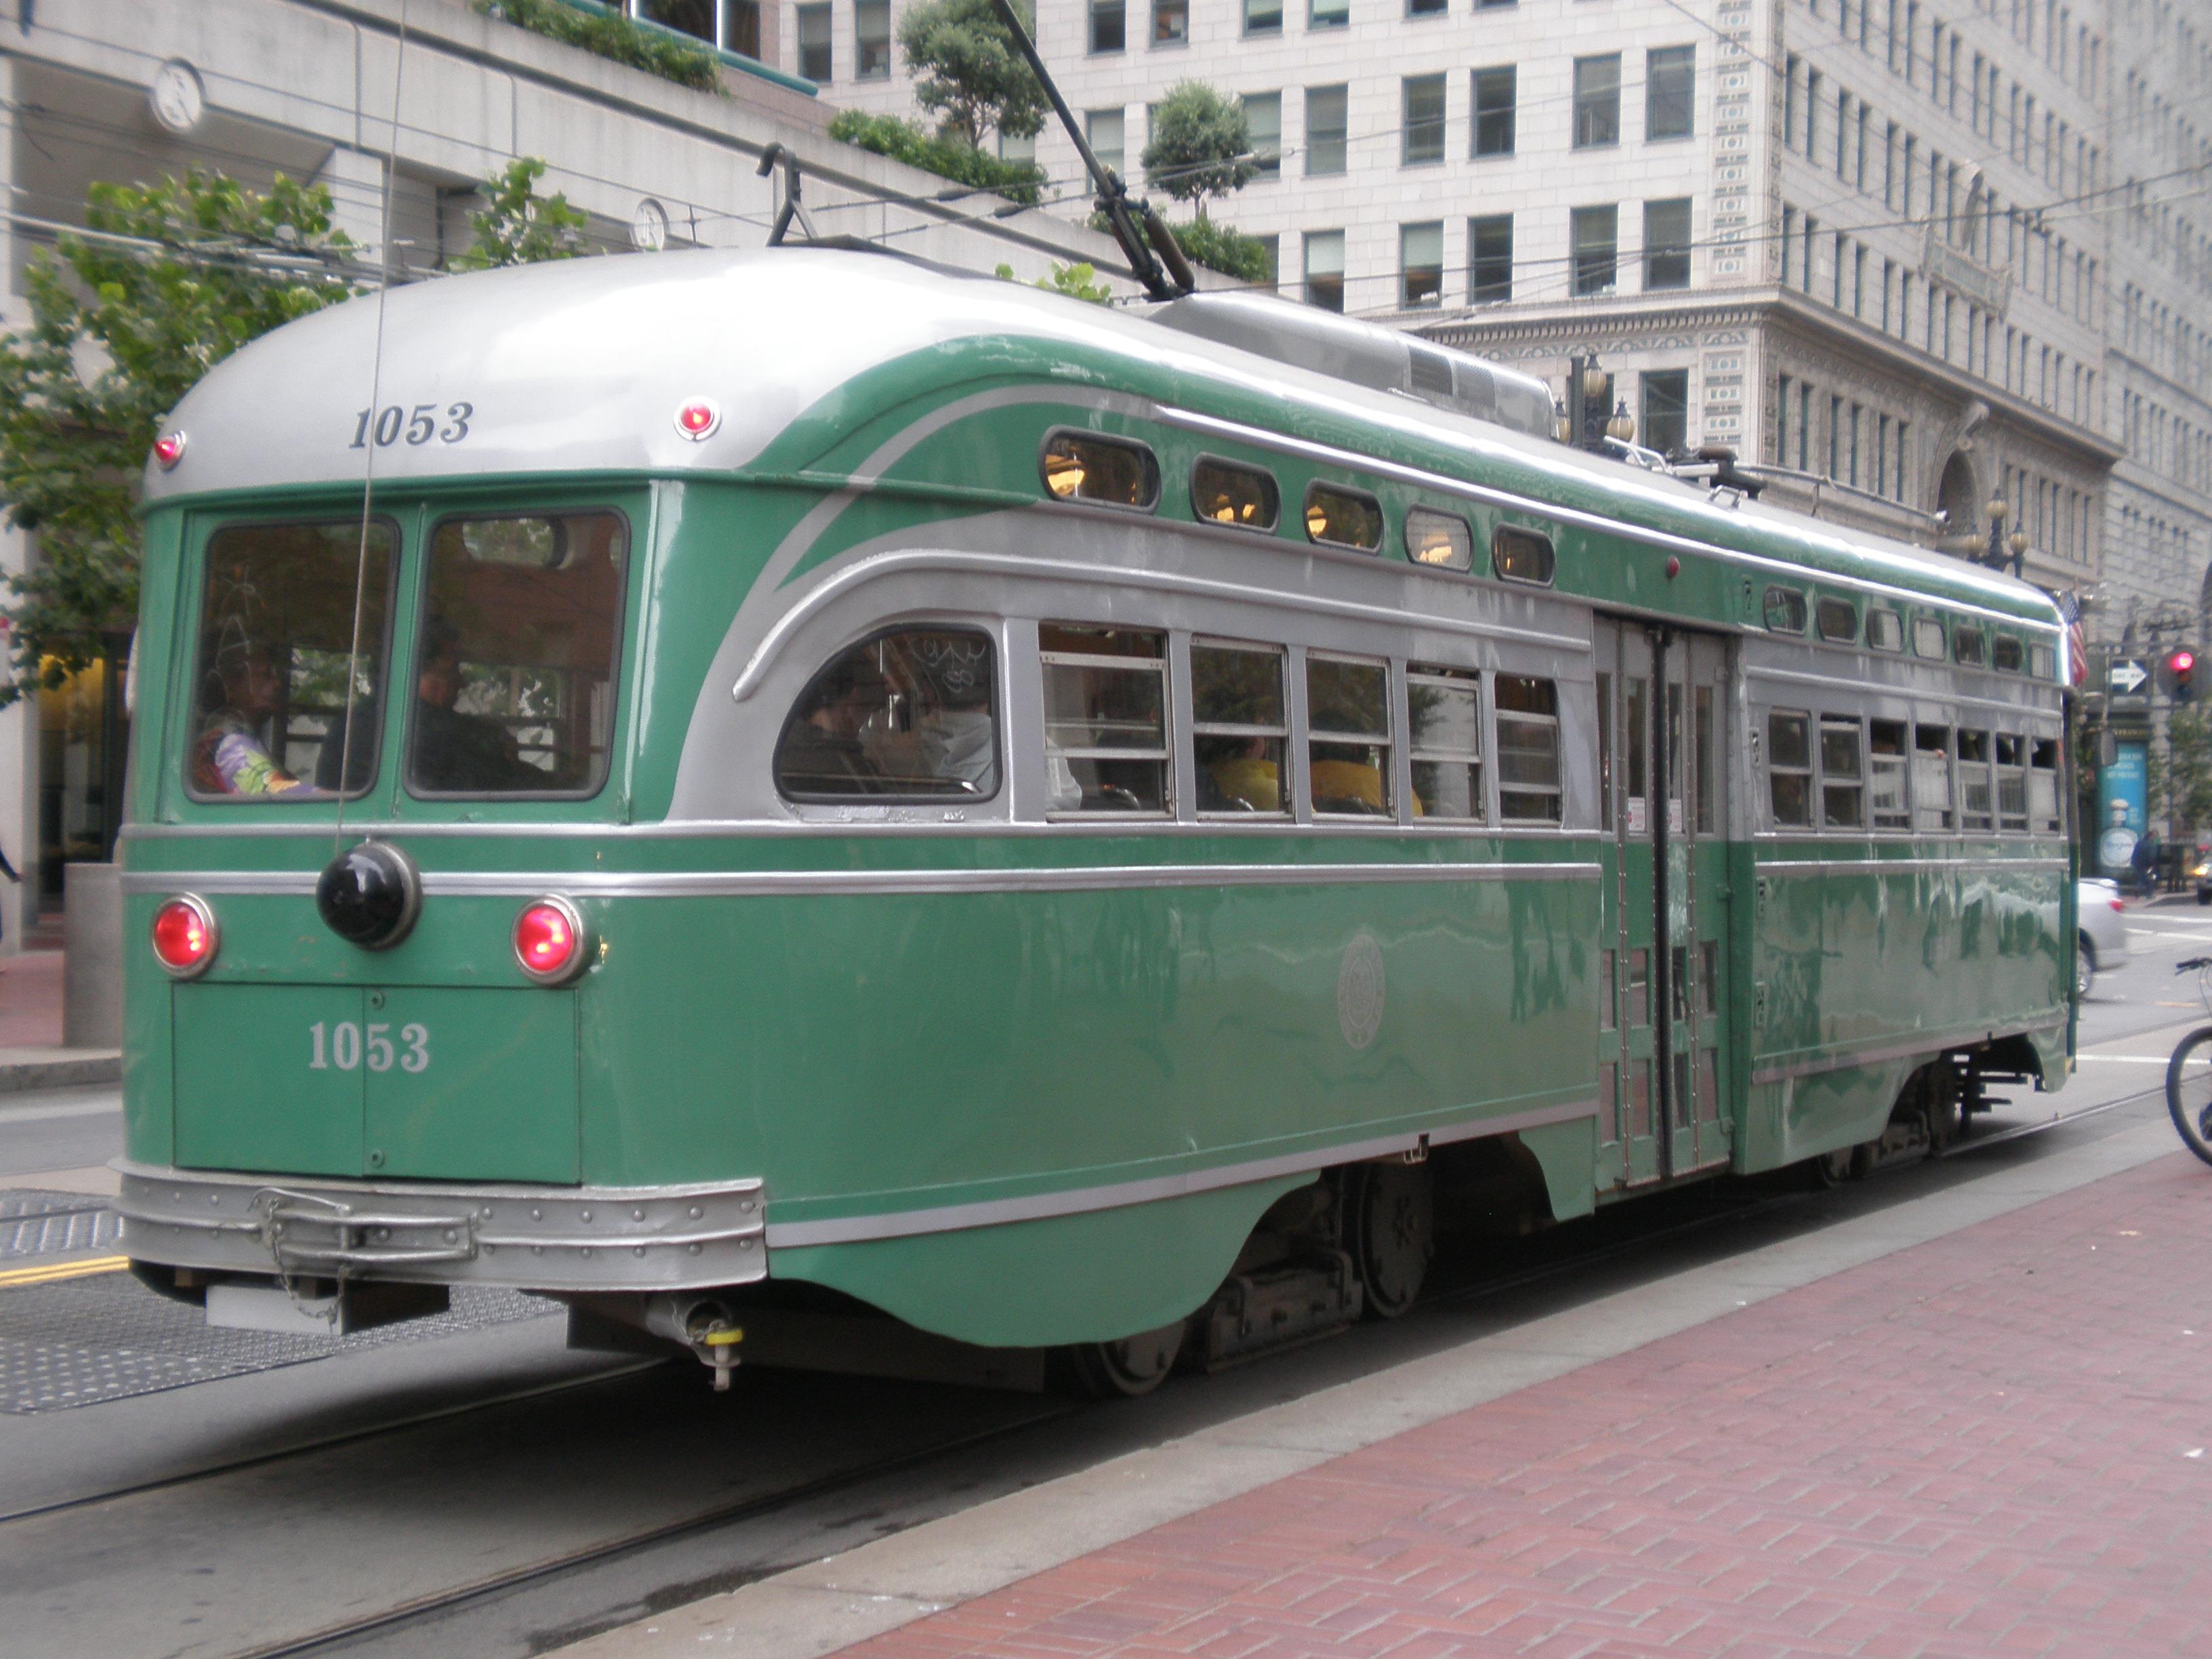 Muni_PCC_streetcar_1053_side.JPG